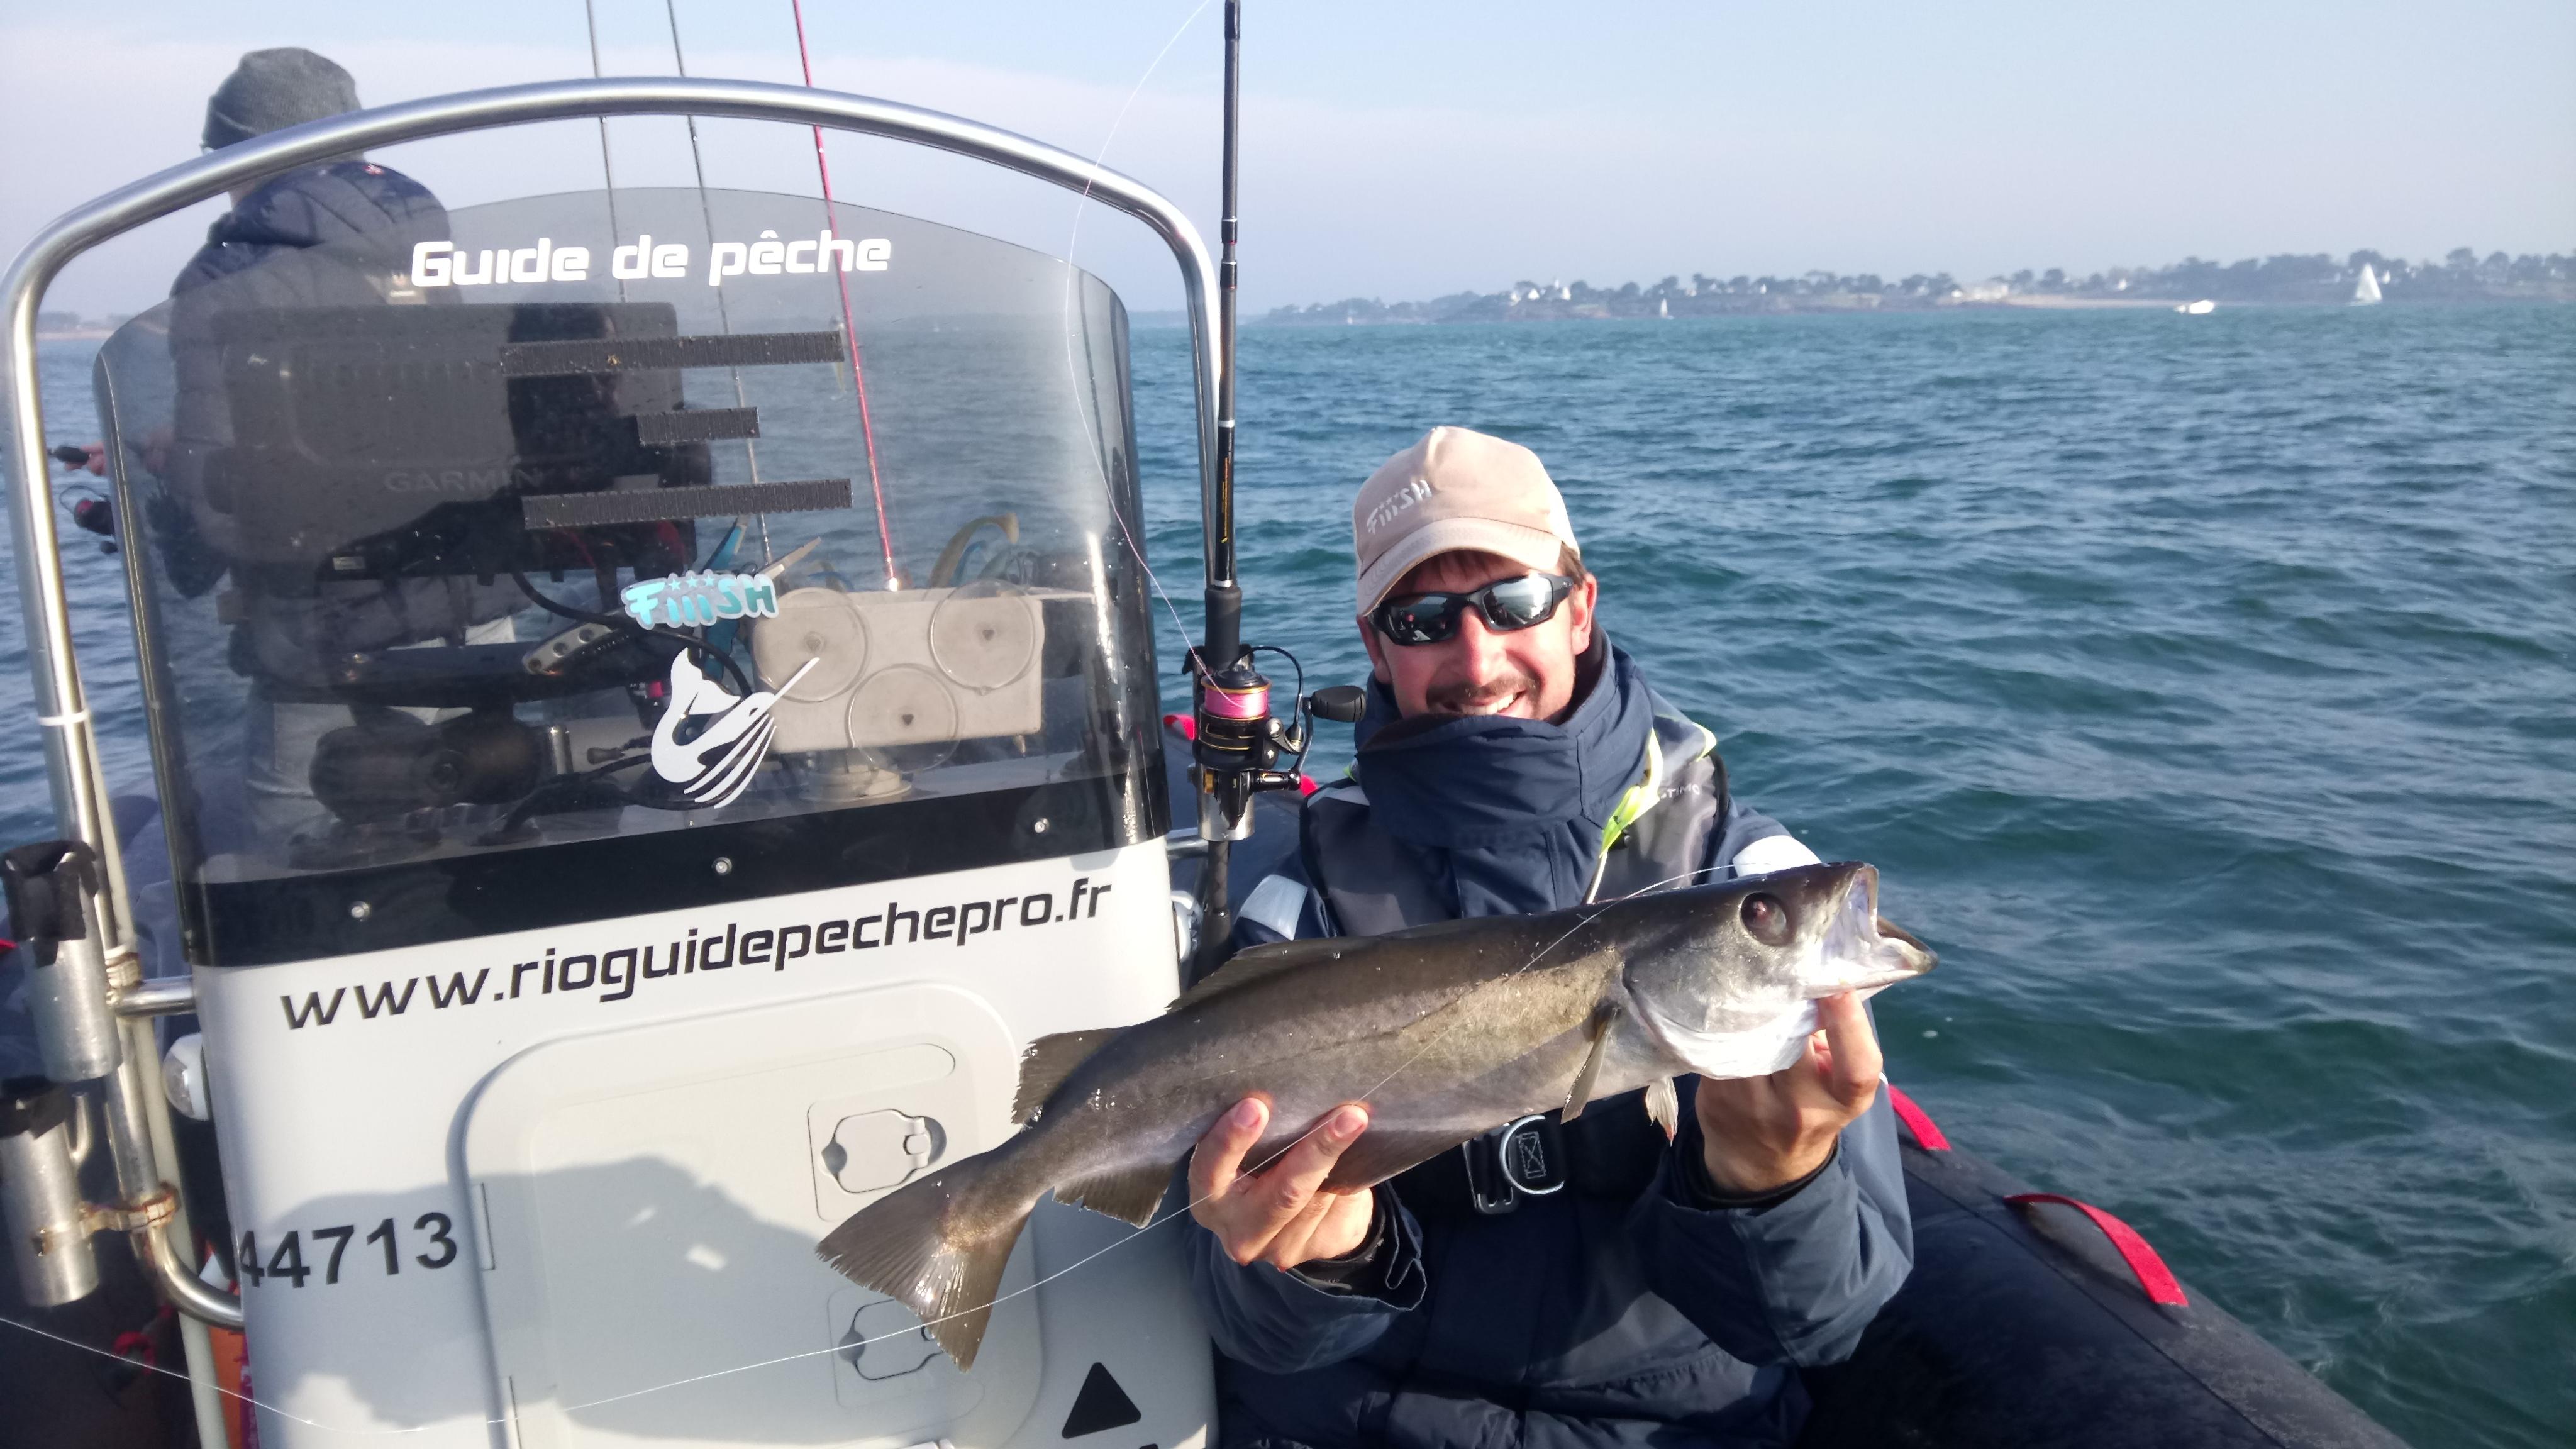 Guide de pêche Morbihan-Guide de pêche Sarzeau- Guide de pêche Golfe du Morbihan-Sortie pêche en mer- pêche au bar Morbihan- Stage de pêche au leurre